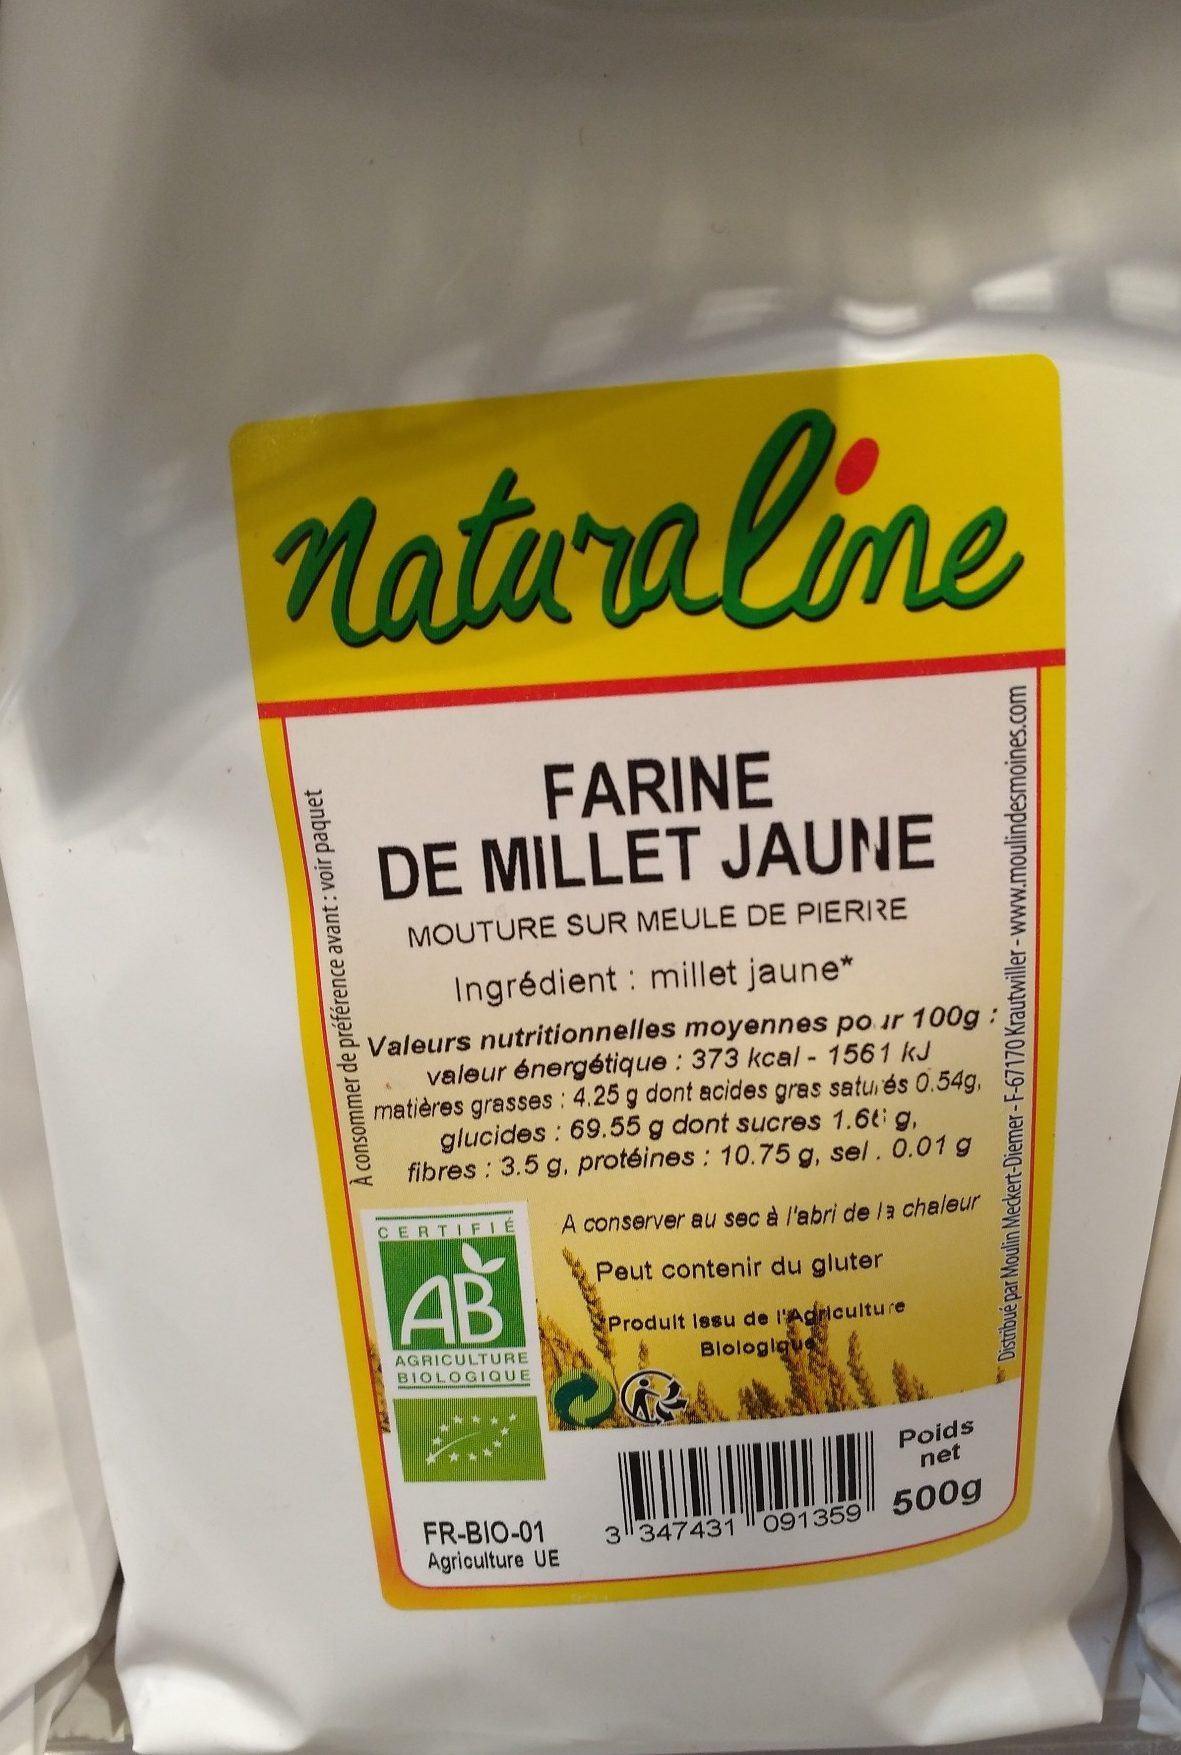 Farine de millet jaune - Produkt - fr